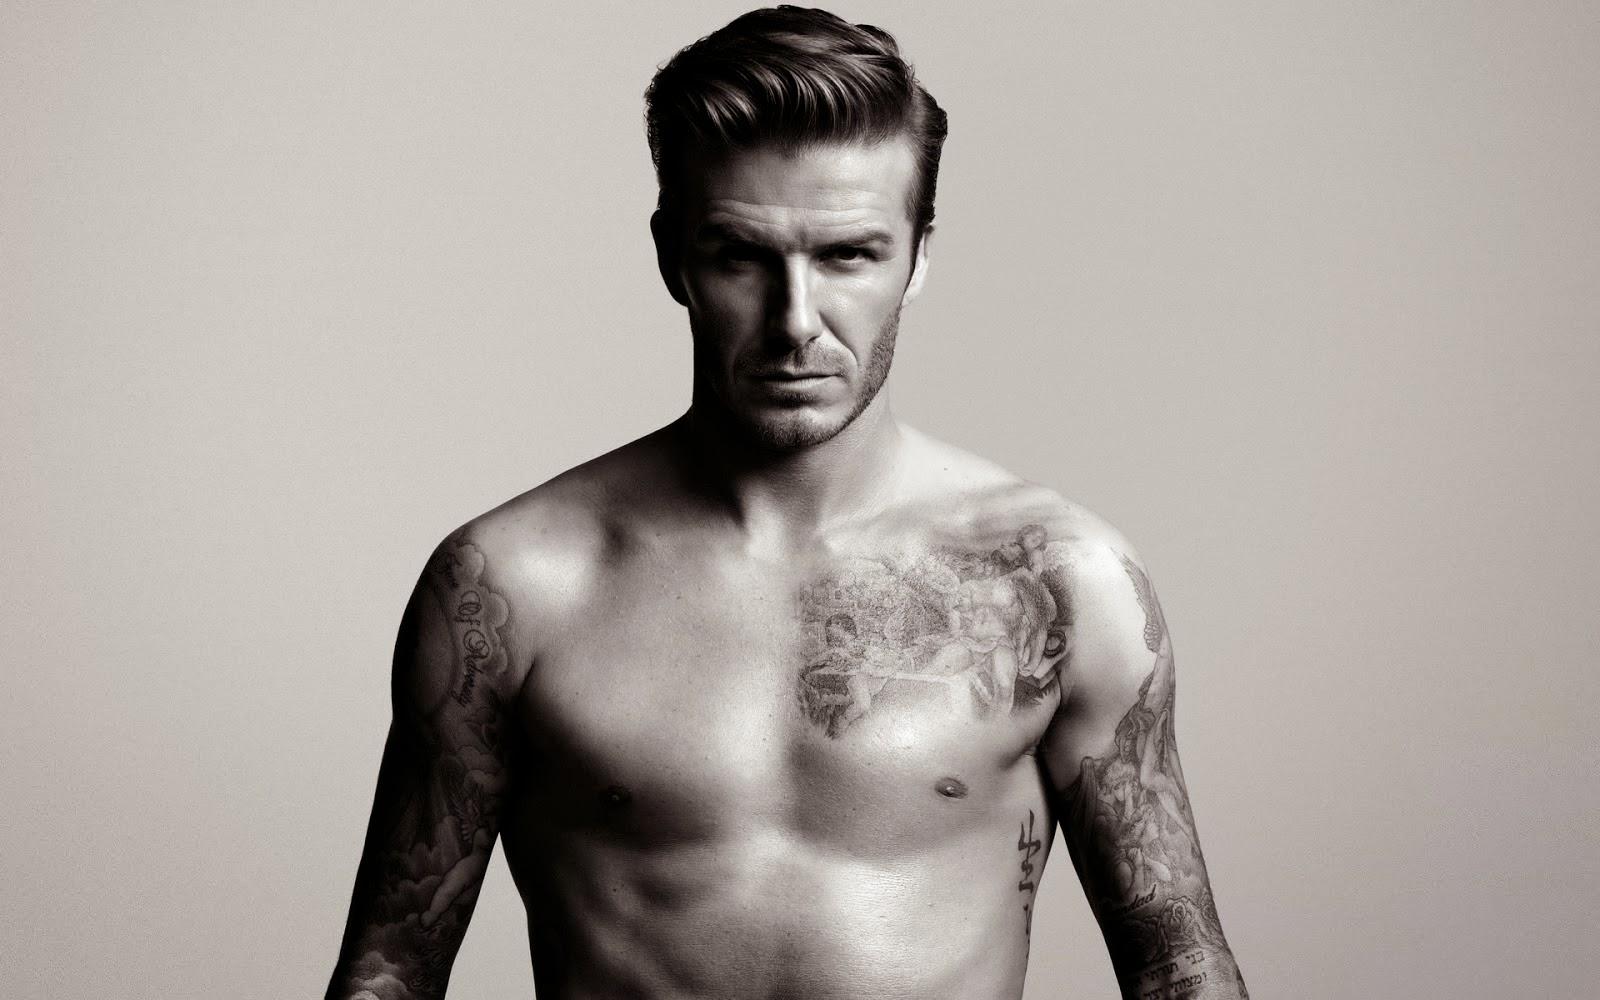 David Beckham New Stylish Wallpaper 2014 1600x1000